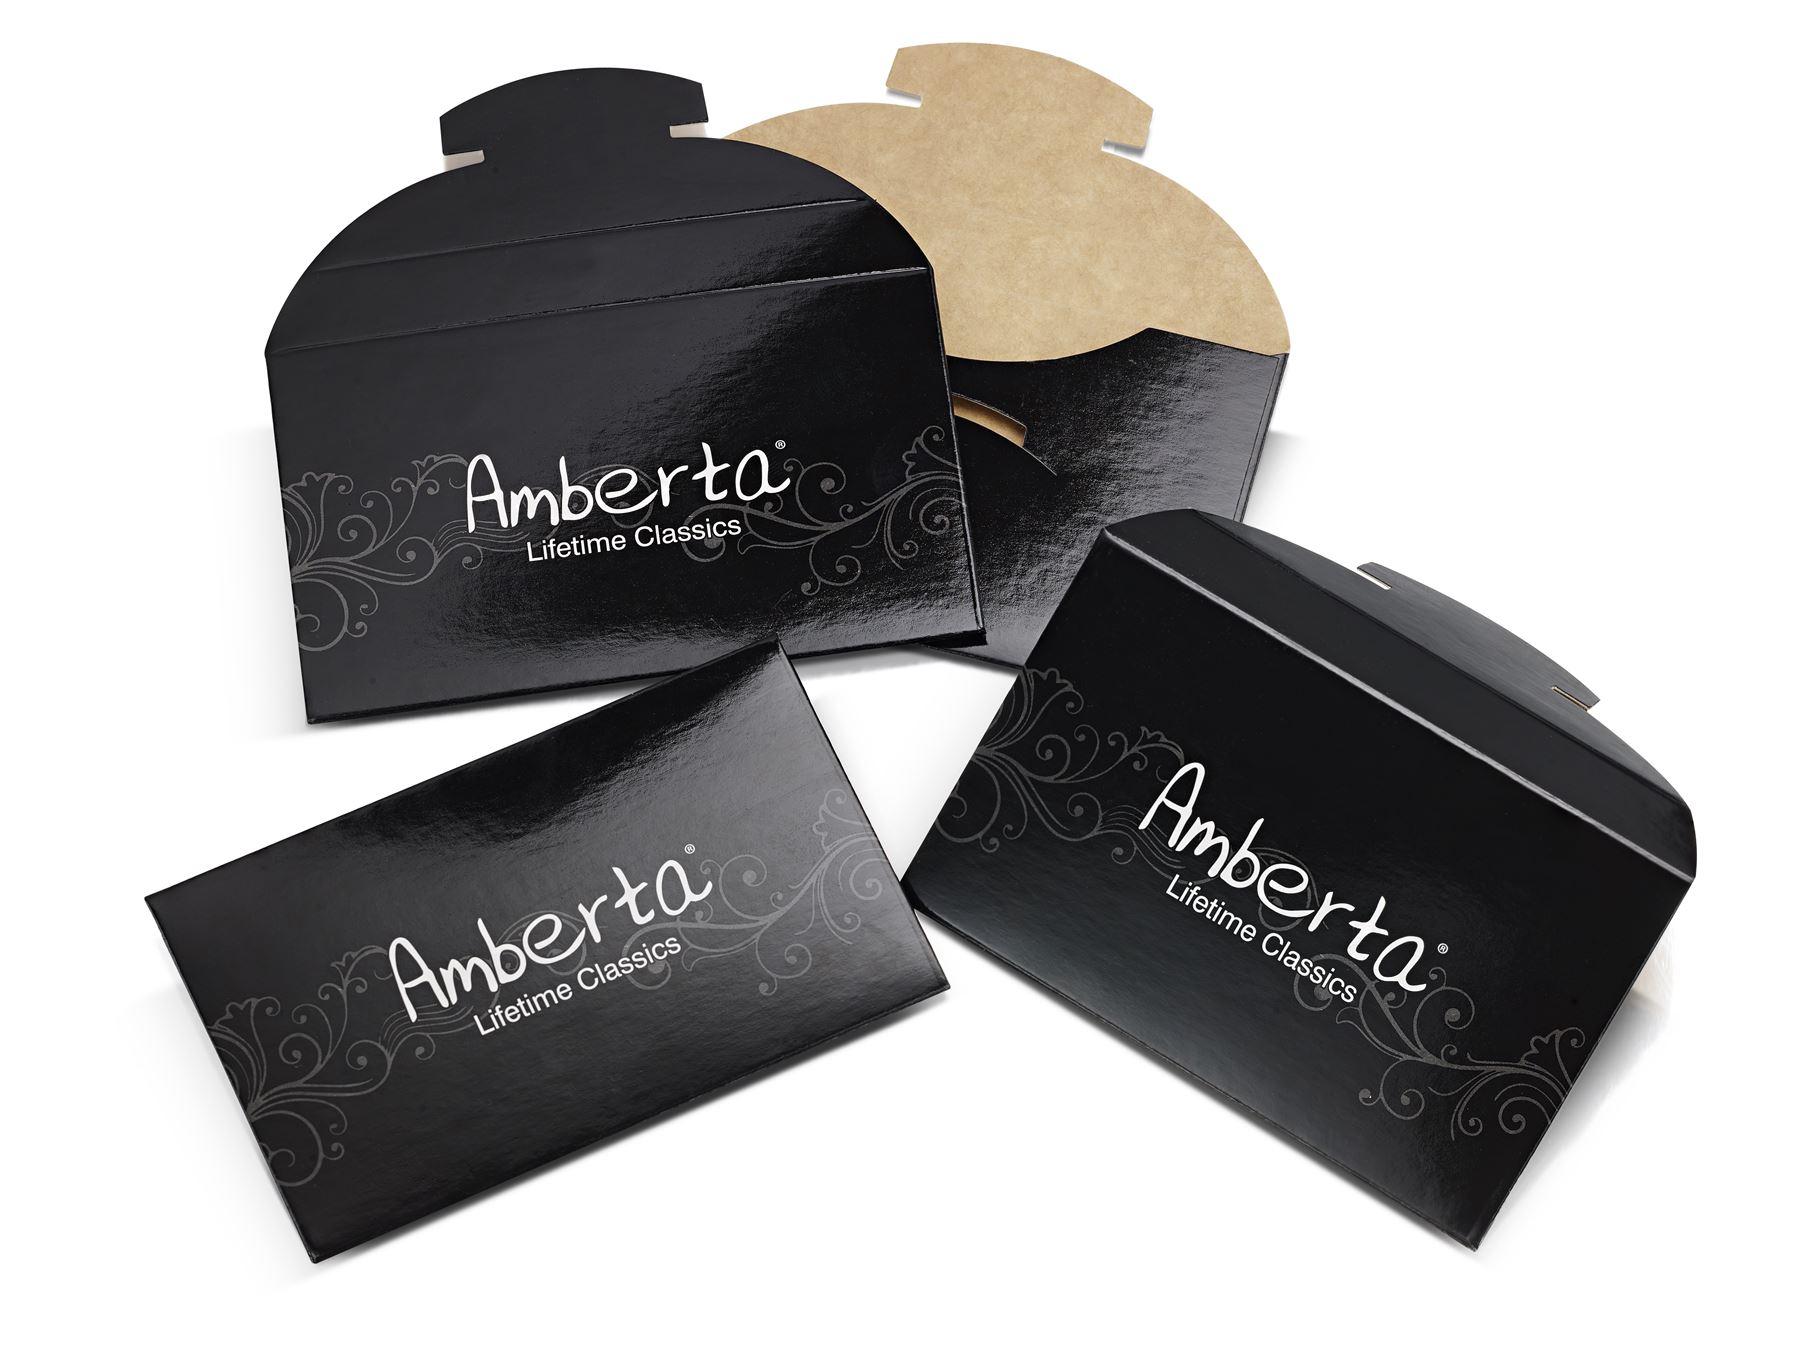 Amberta-Jewelry-925-Sterling-Silver-Adjustable-Bracelet-Italian-Bangle-for-Women thumbnail 79